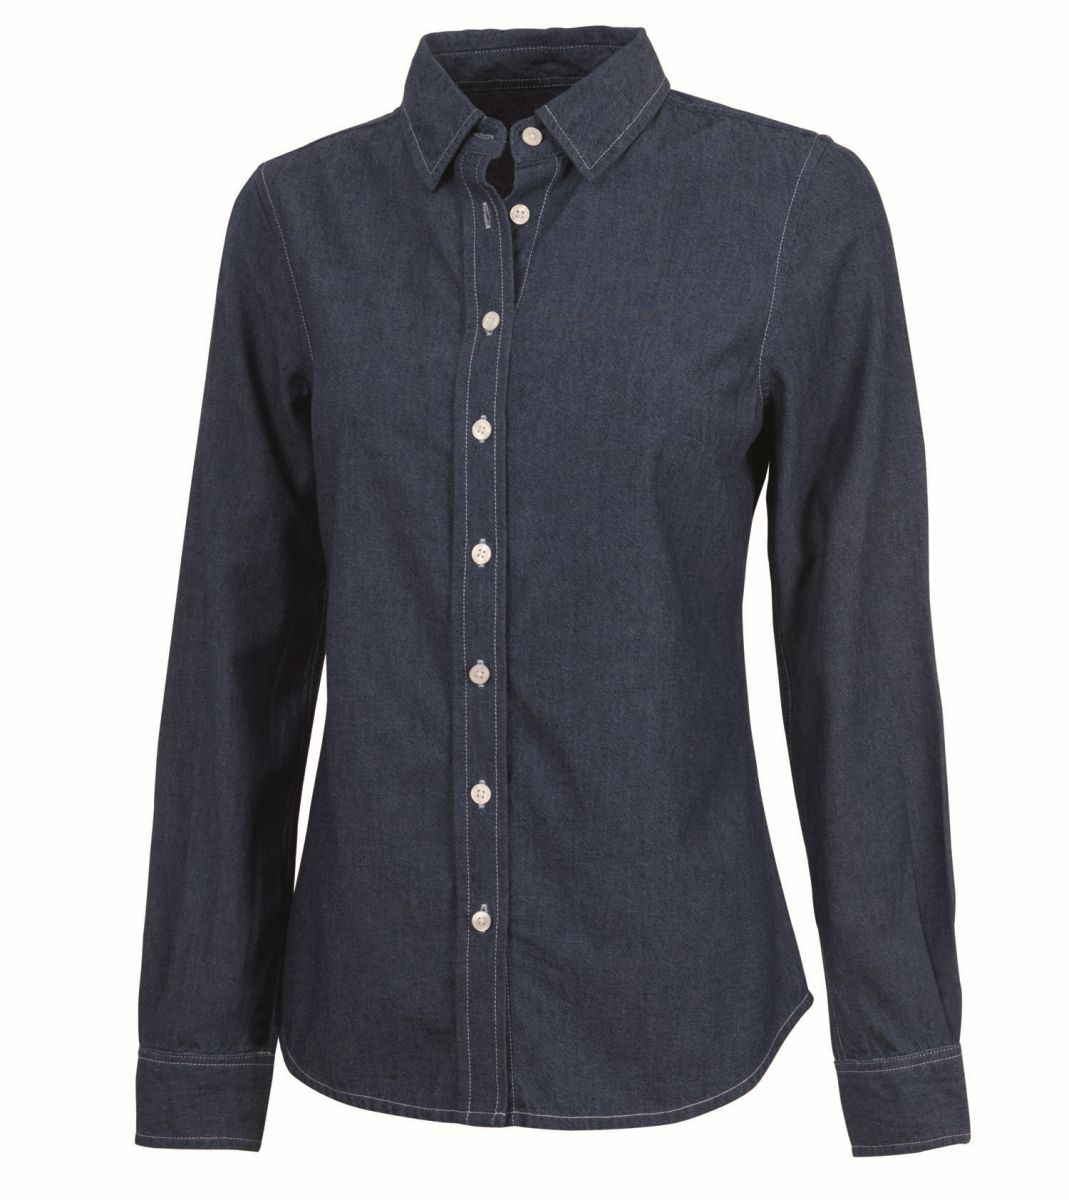 Women's Straight Collar Chambray Shirt